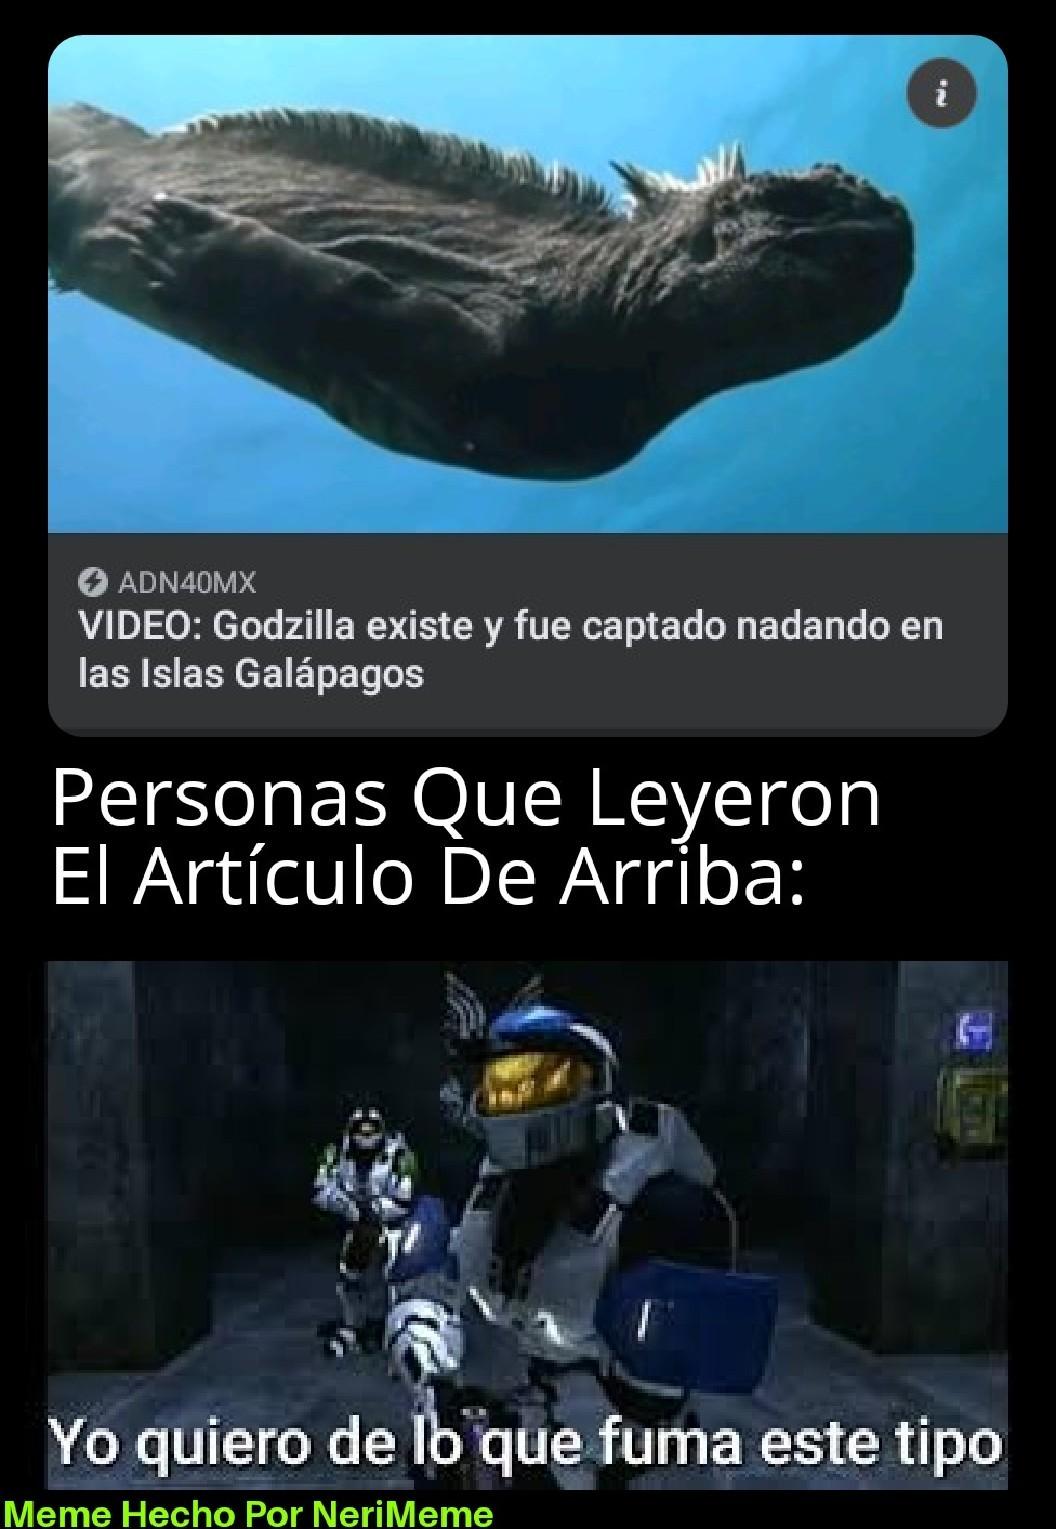 Meme: Dicen Que Un Fotógrafo Vio A Godzilla